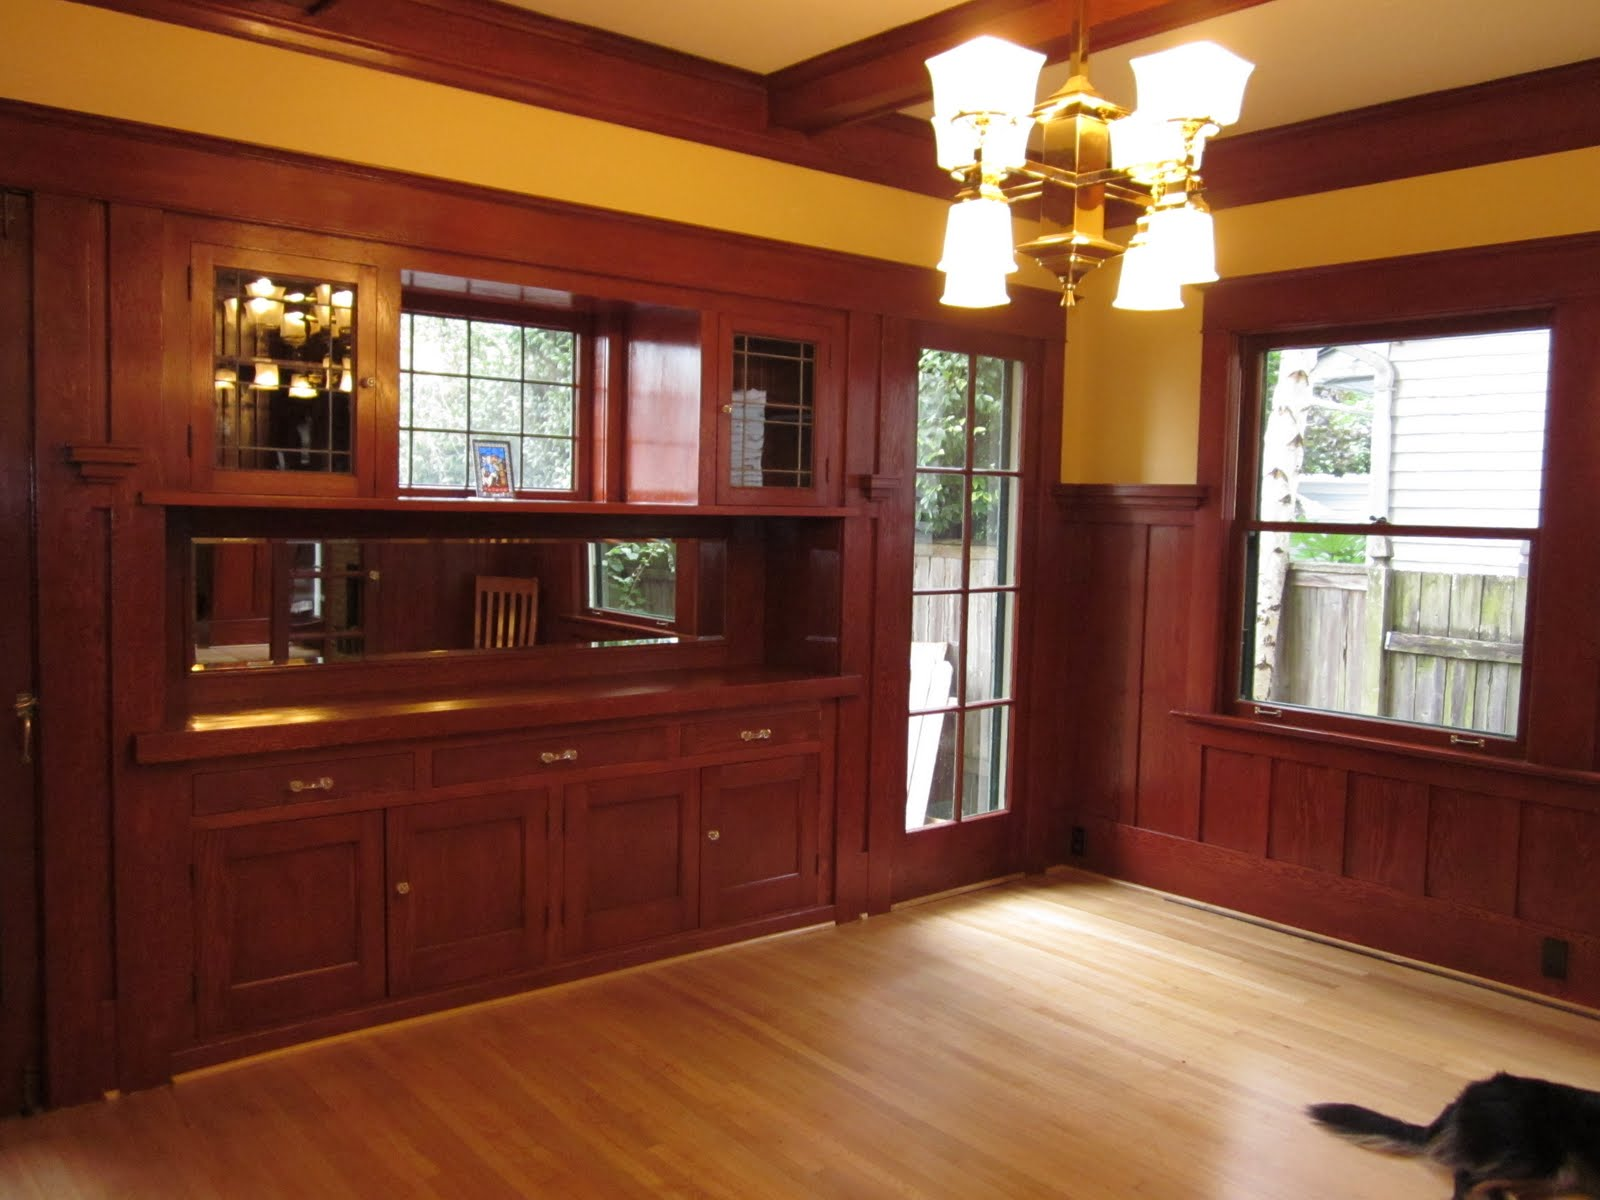 bungalow dining room   Laurelhurst Craftsman Bungalow: Dining Room After Photos